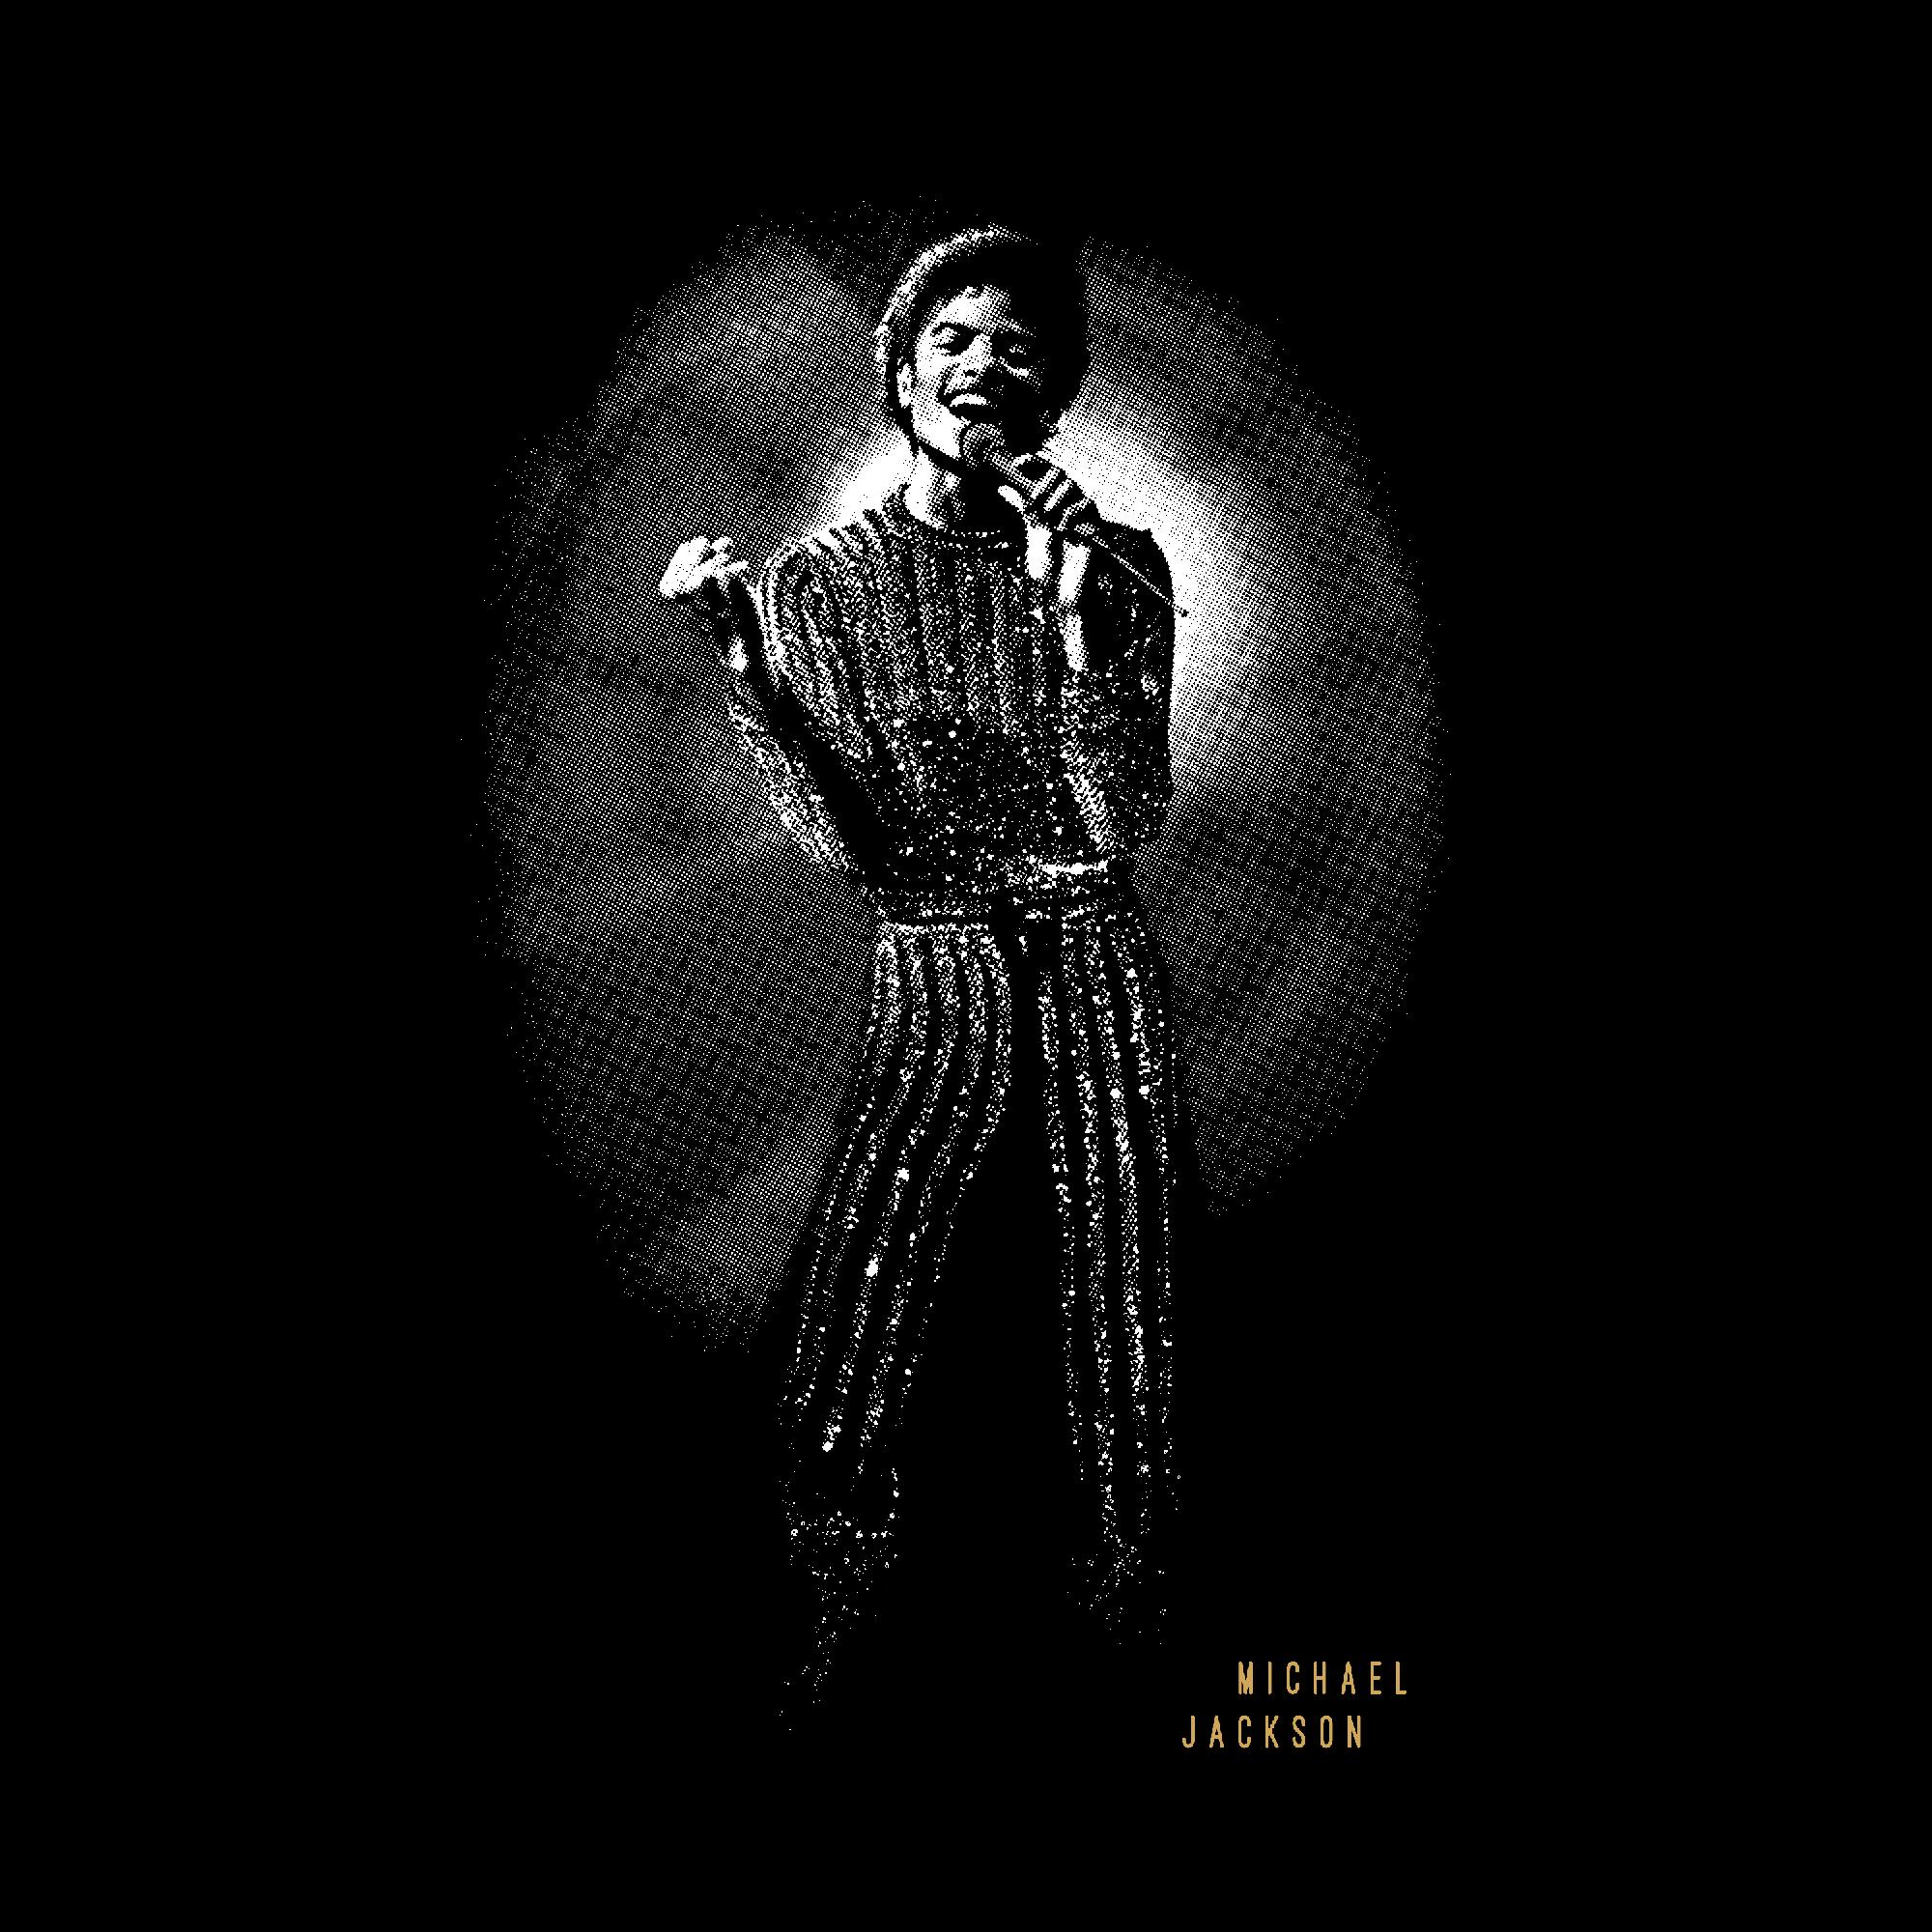 Quadro A4 - Michael Jackson